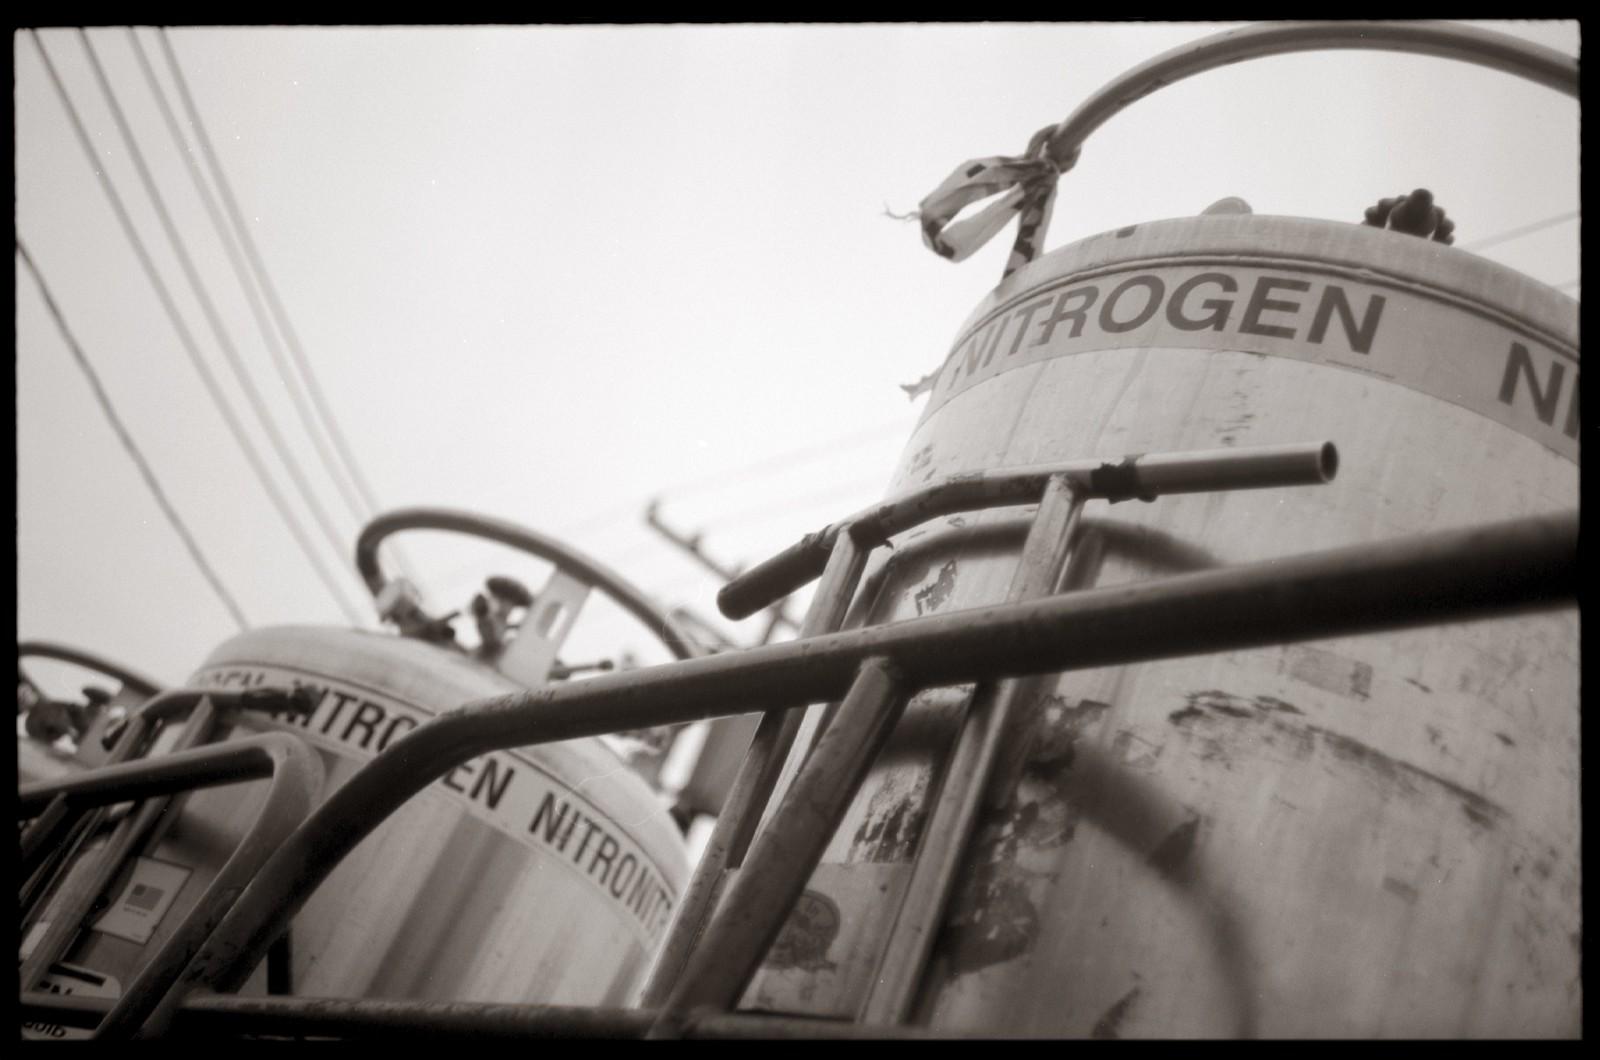 Nitrogen | by efo